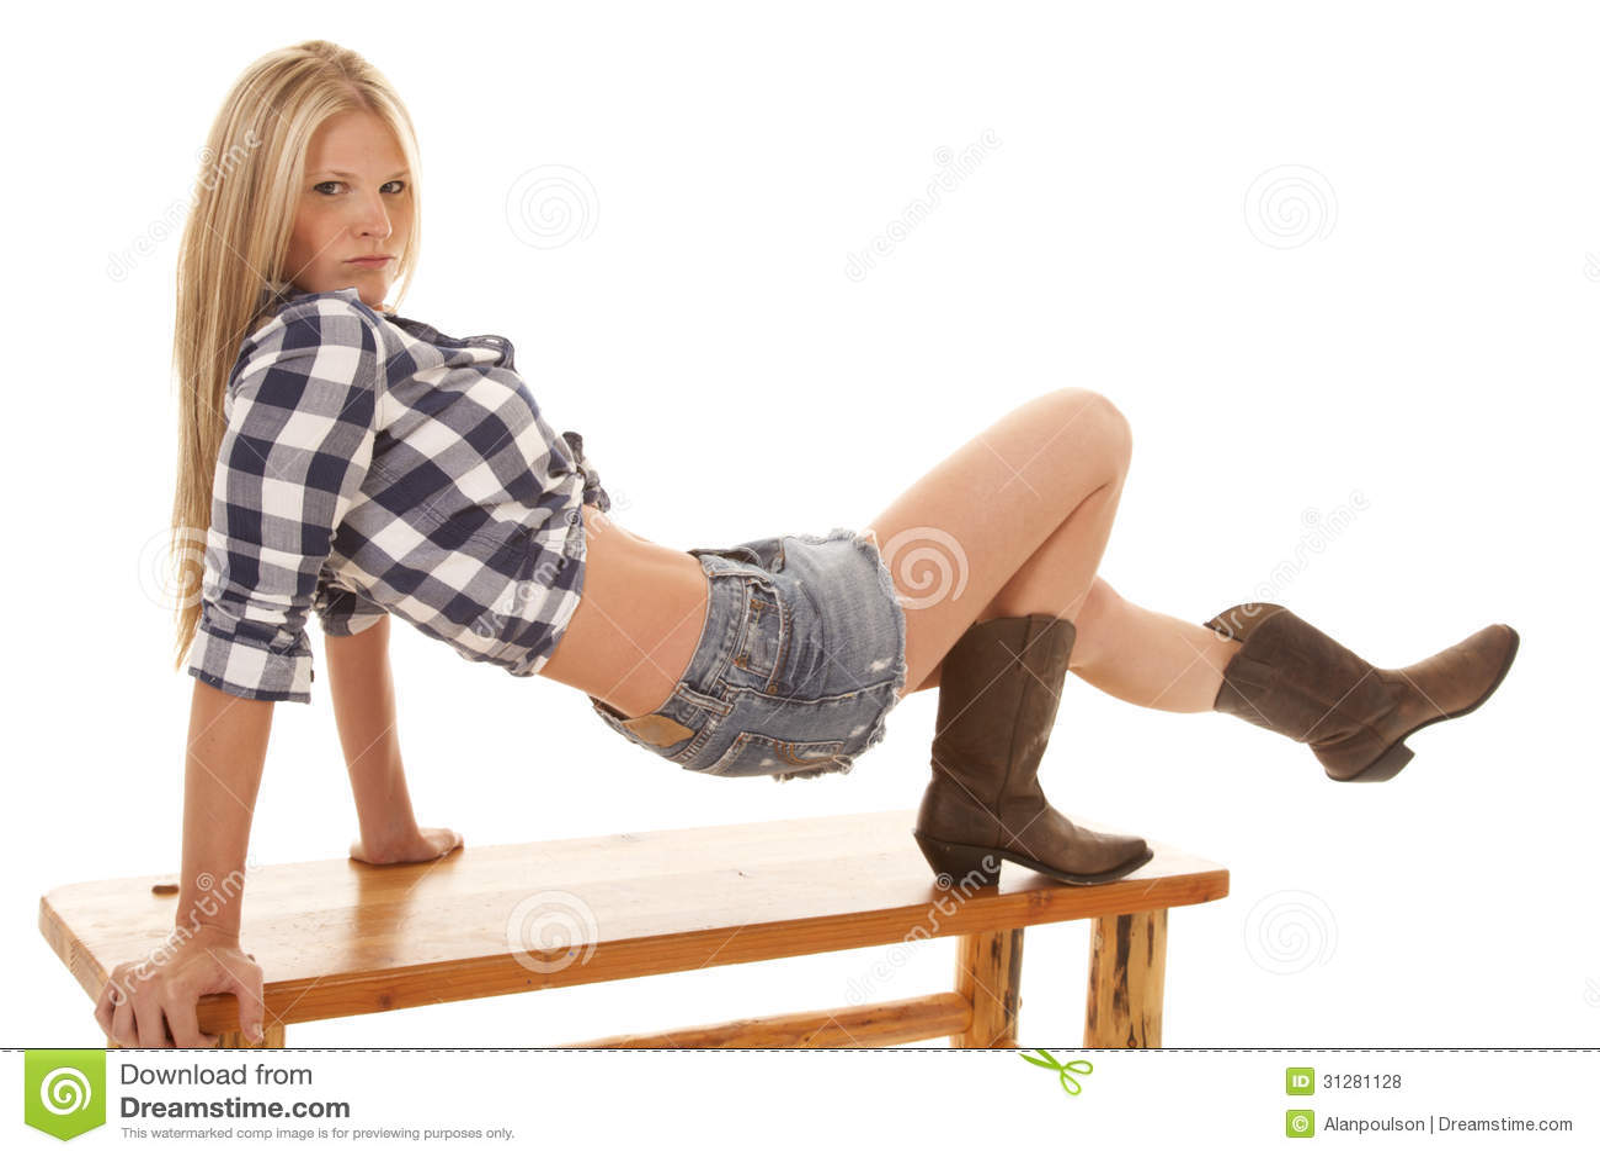 woman blue plaid shirt skirt up bench royalty free stock redneck clipart logos redneck clipart free cartoons